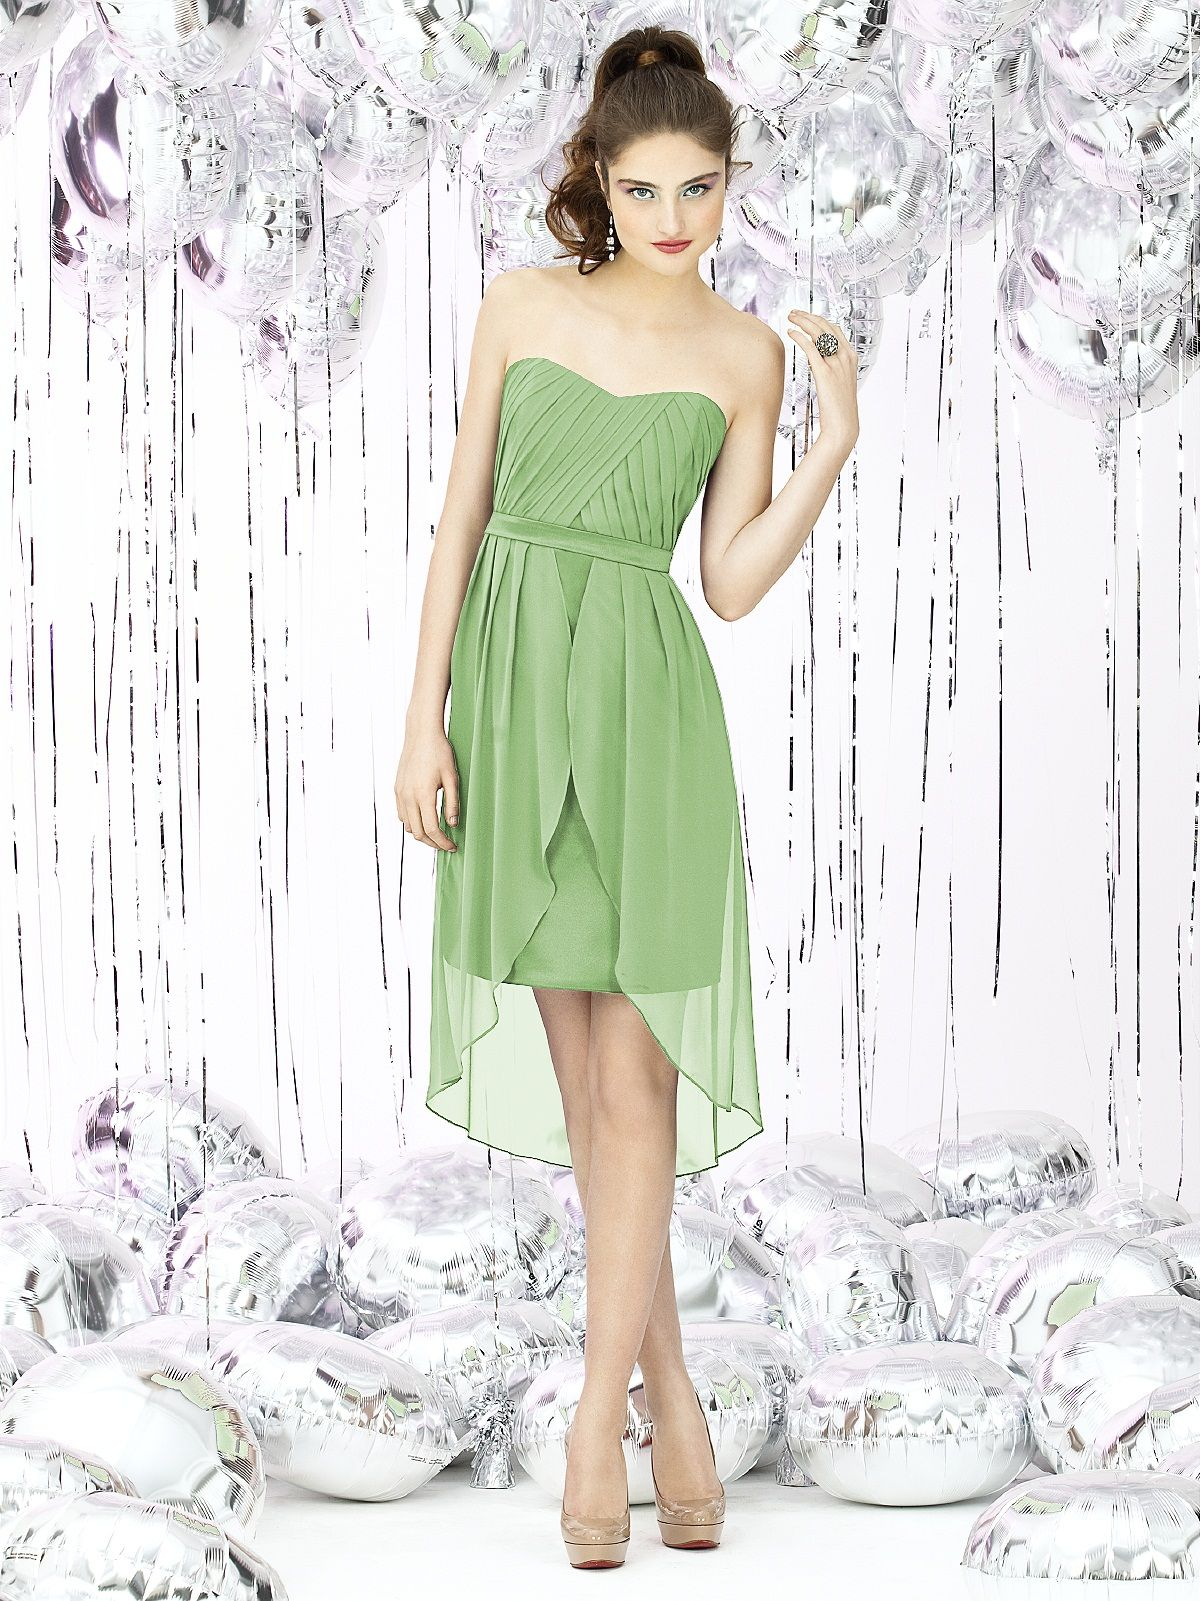 Apple Slice Bridesmaids Dress